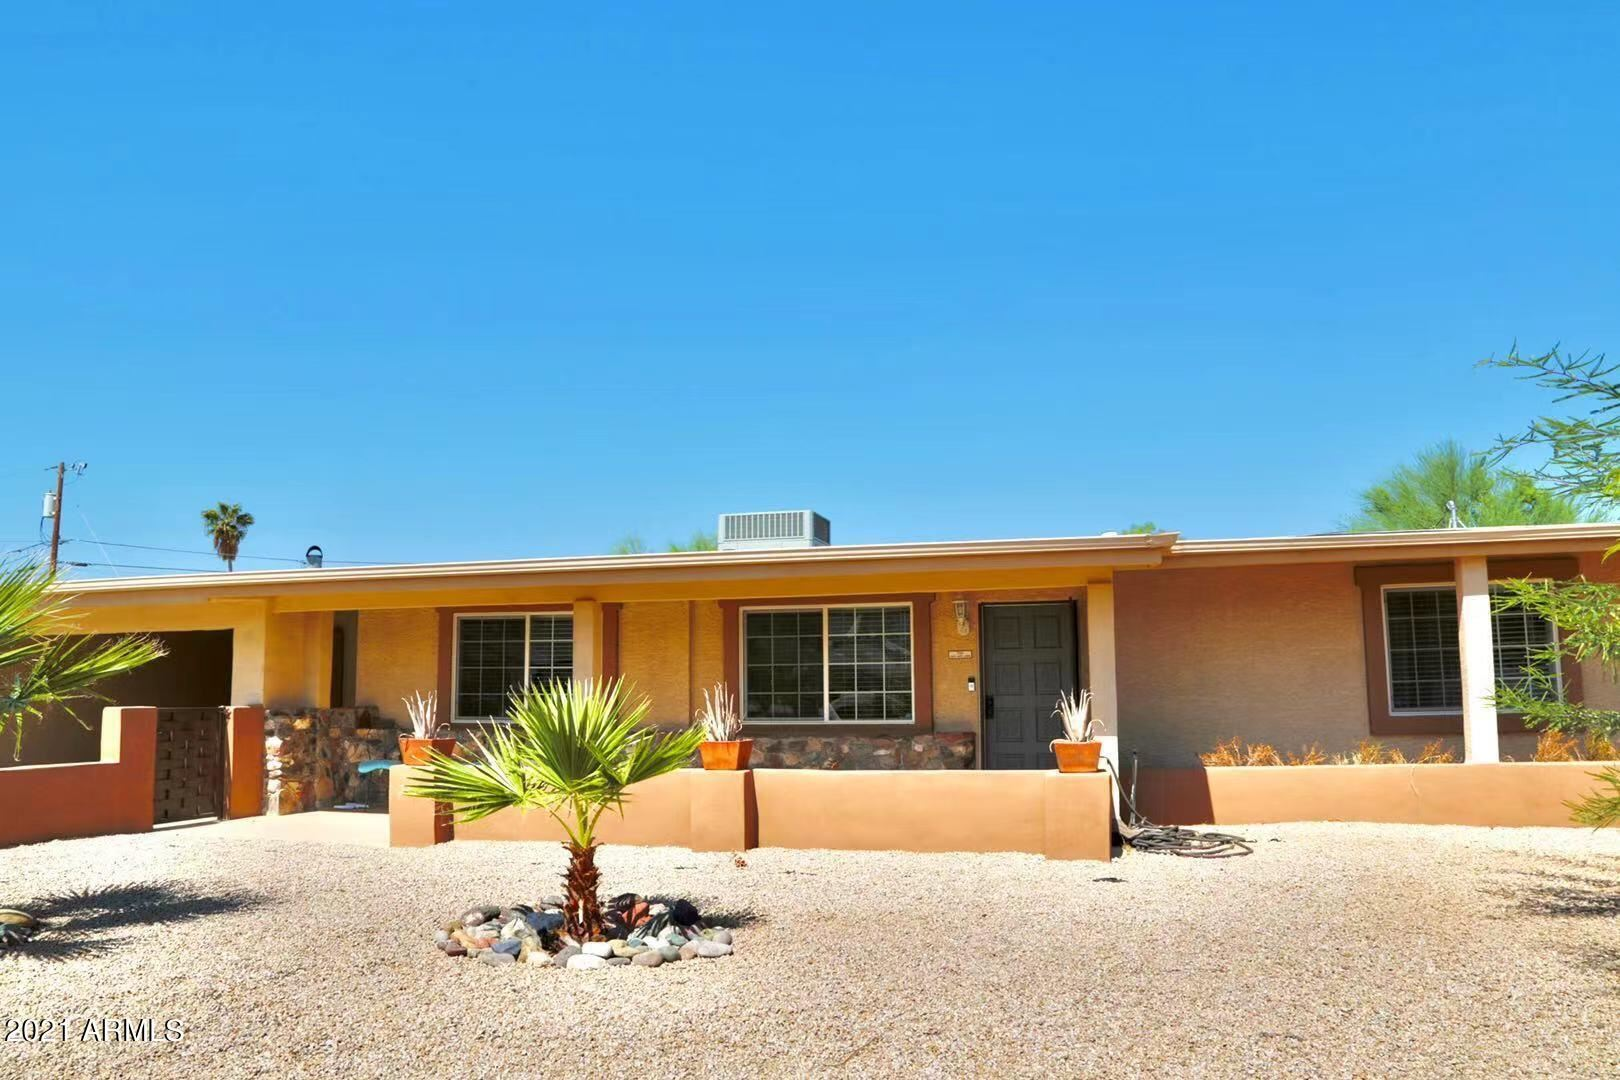 1702 E AIRE LIBRE Avenue E, Phoenix, AZ 85022 - MLS#: 6298048